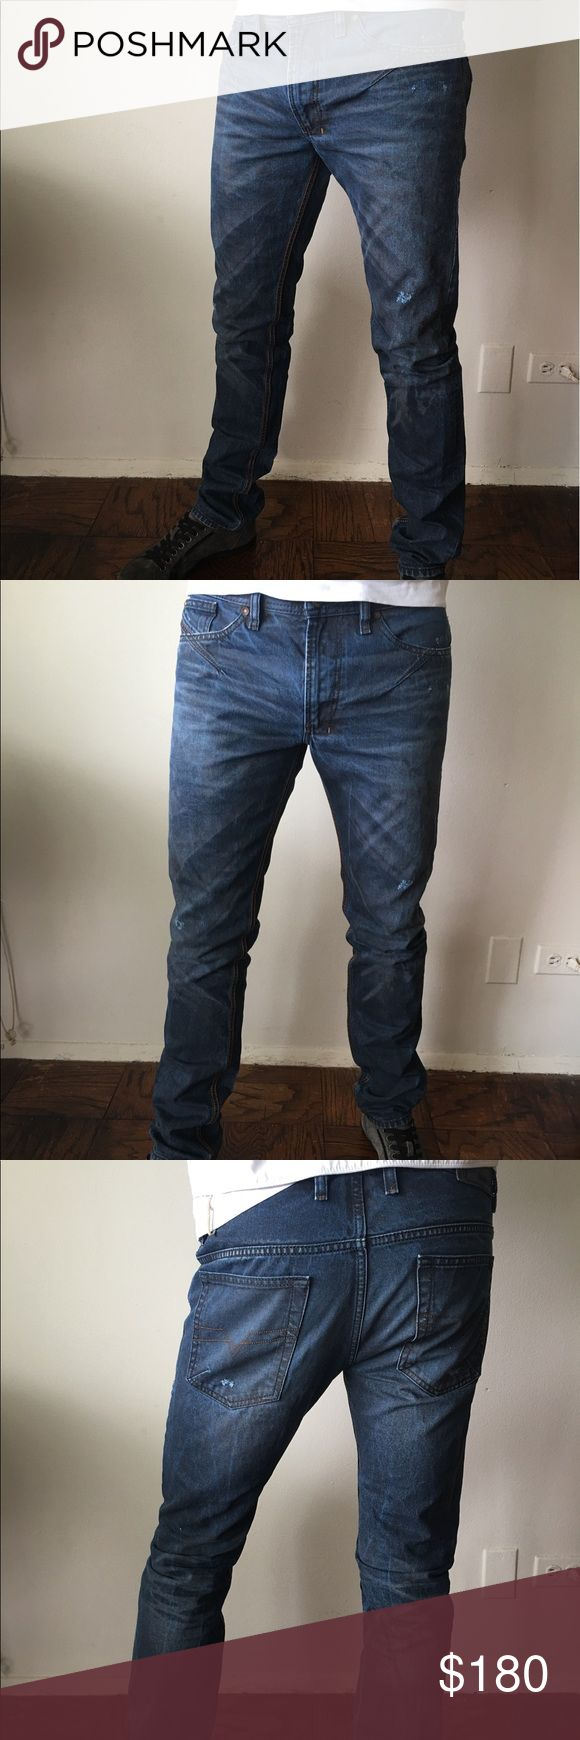 Jeans Men's jeans Diesel Black Gold Diesel Black Gold Jeans Straight